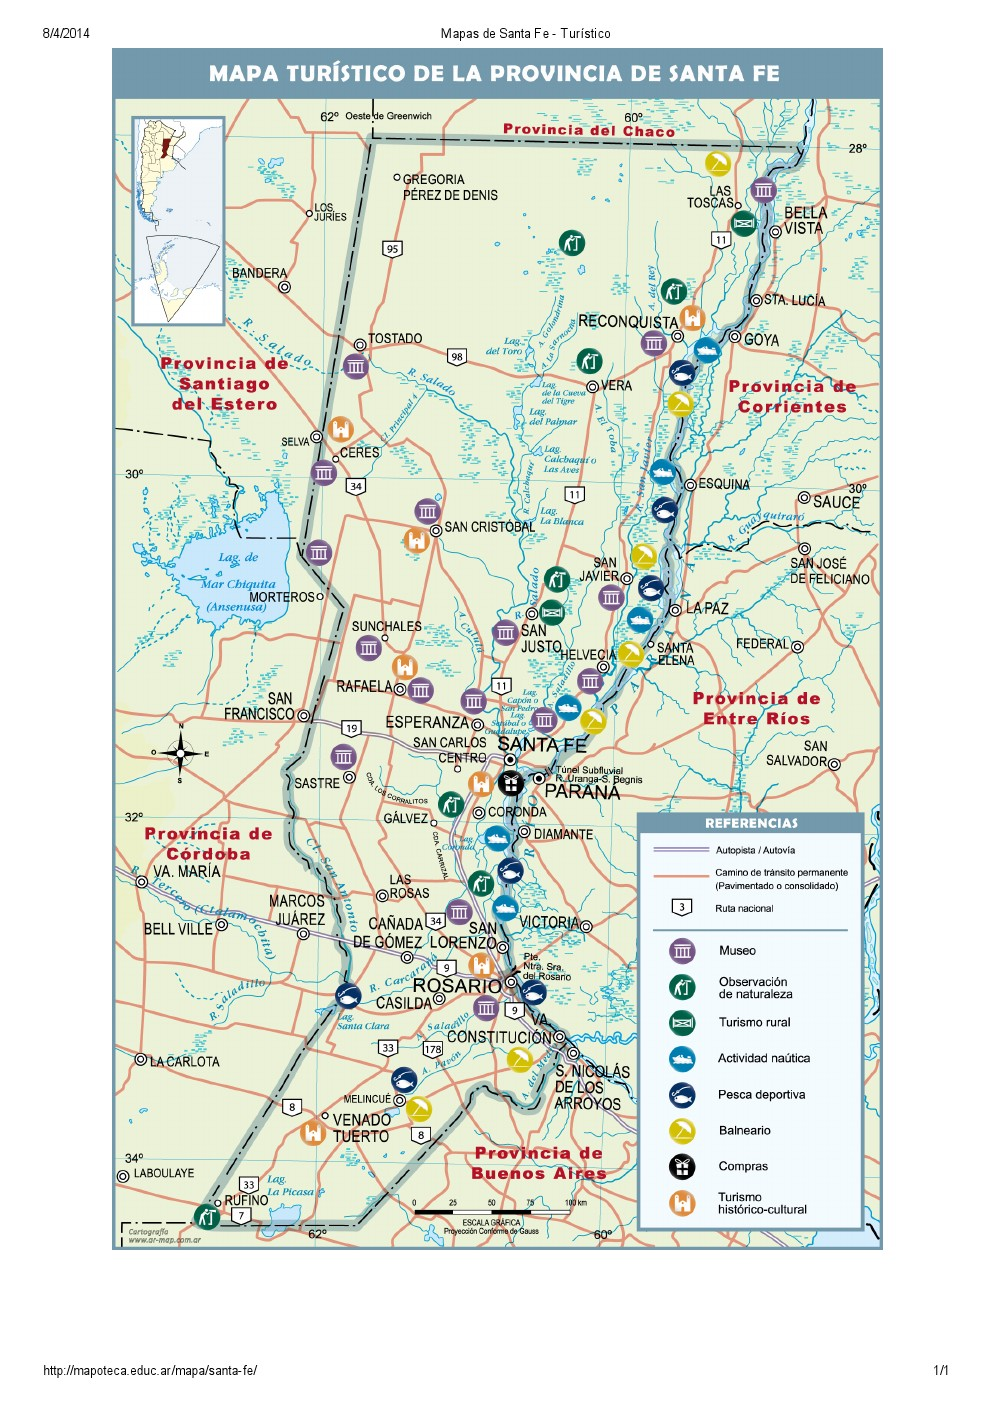 Mapa turístico de Santa Fe. Mapoteca de Educ.ar